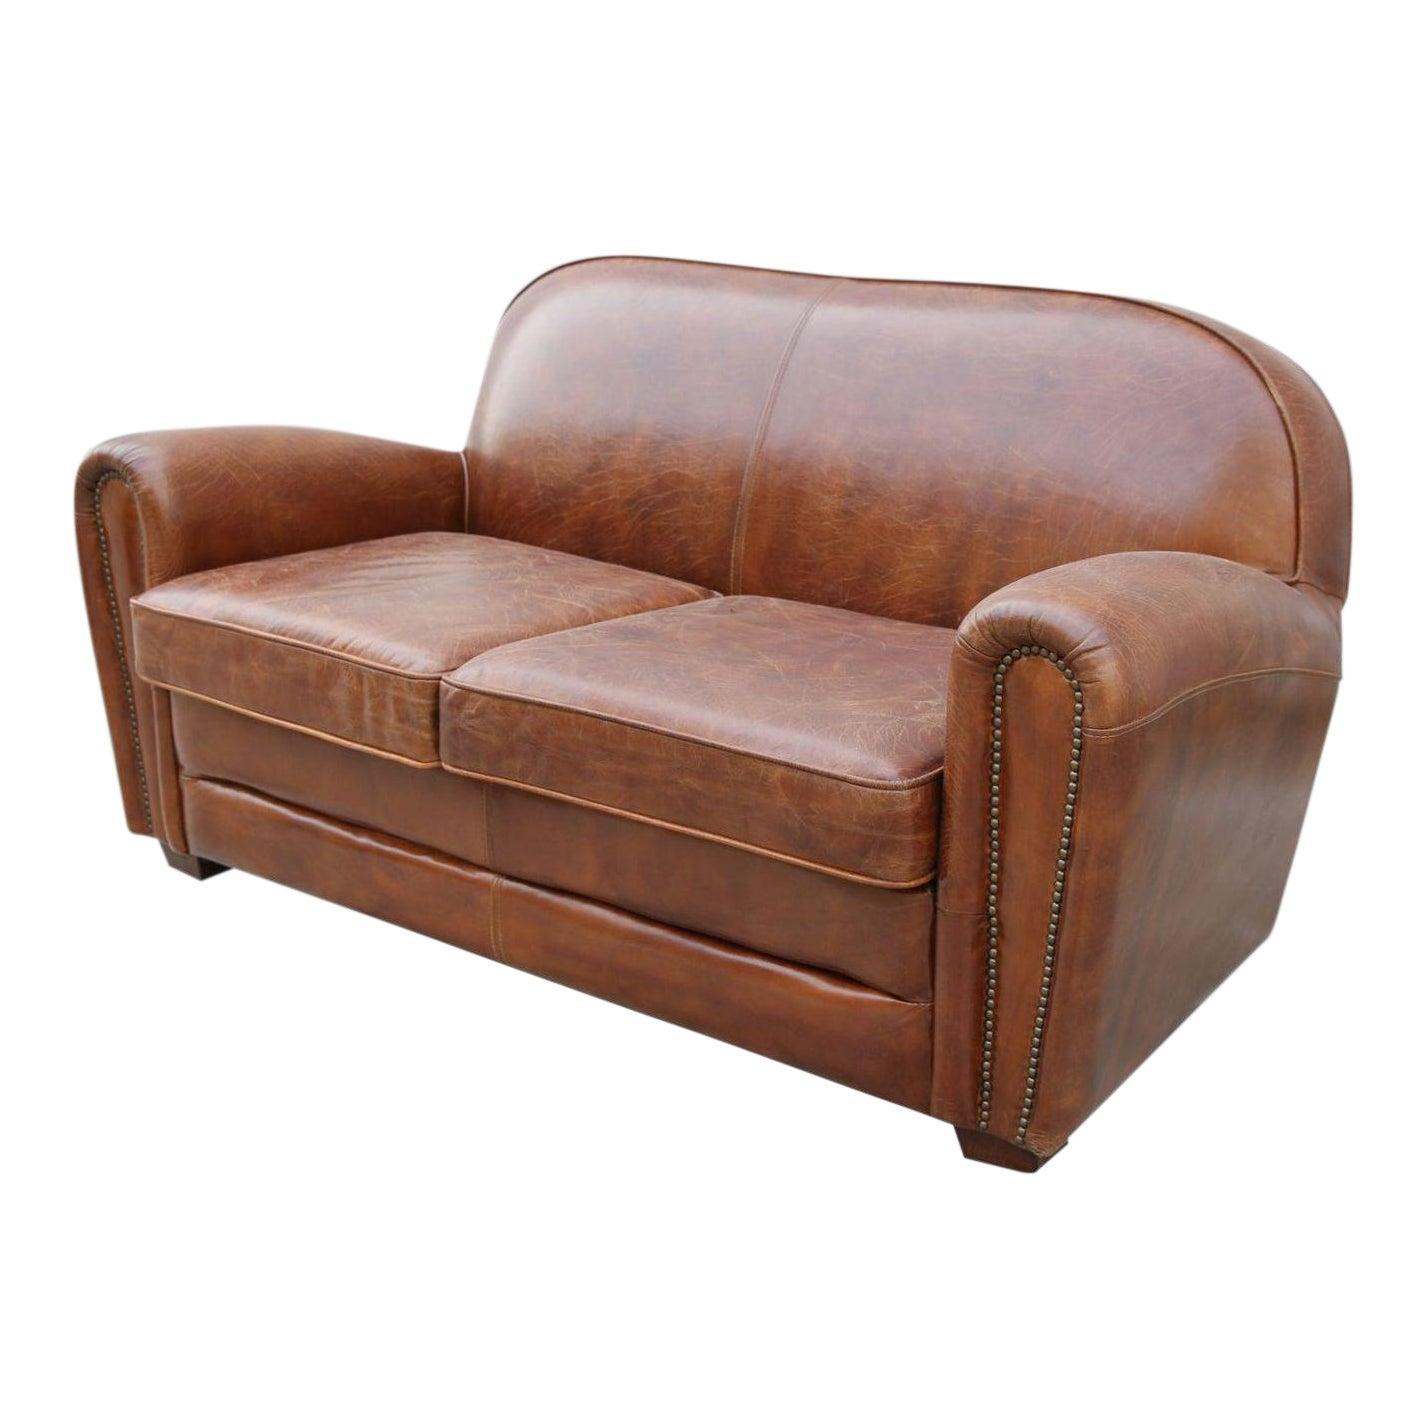 Pleasing Paris Club Brown Leather Love Seat Sofa Creativecarmelina Interior Chair Design Creativecarmelinacom